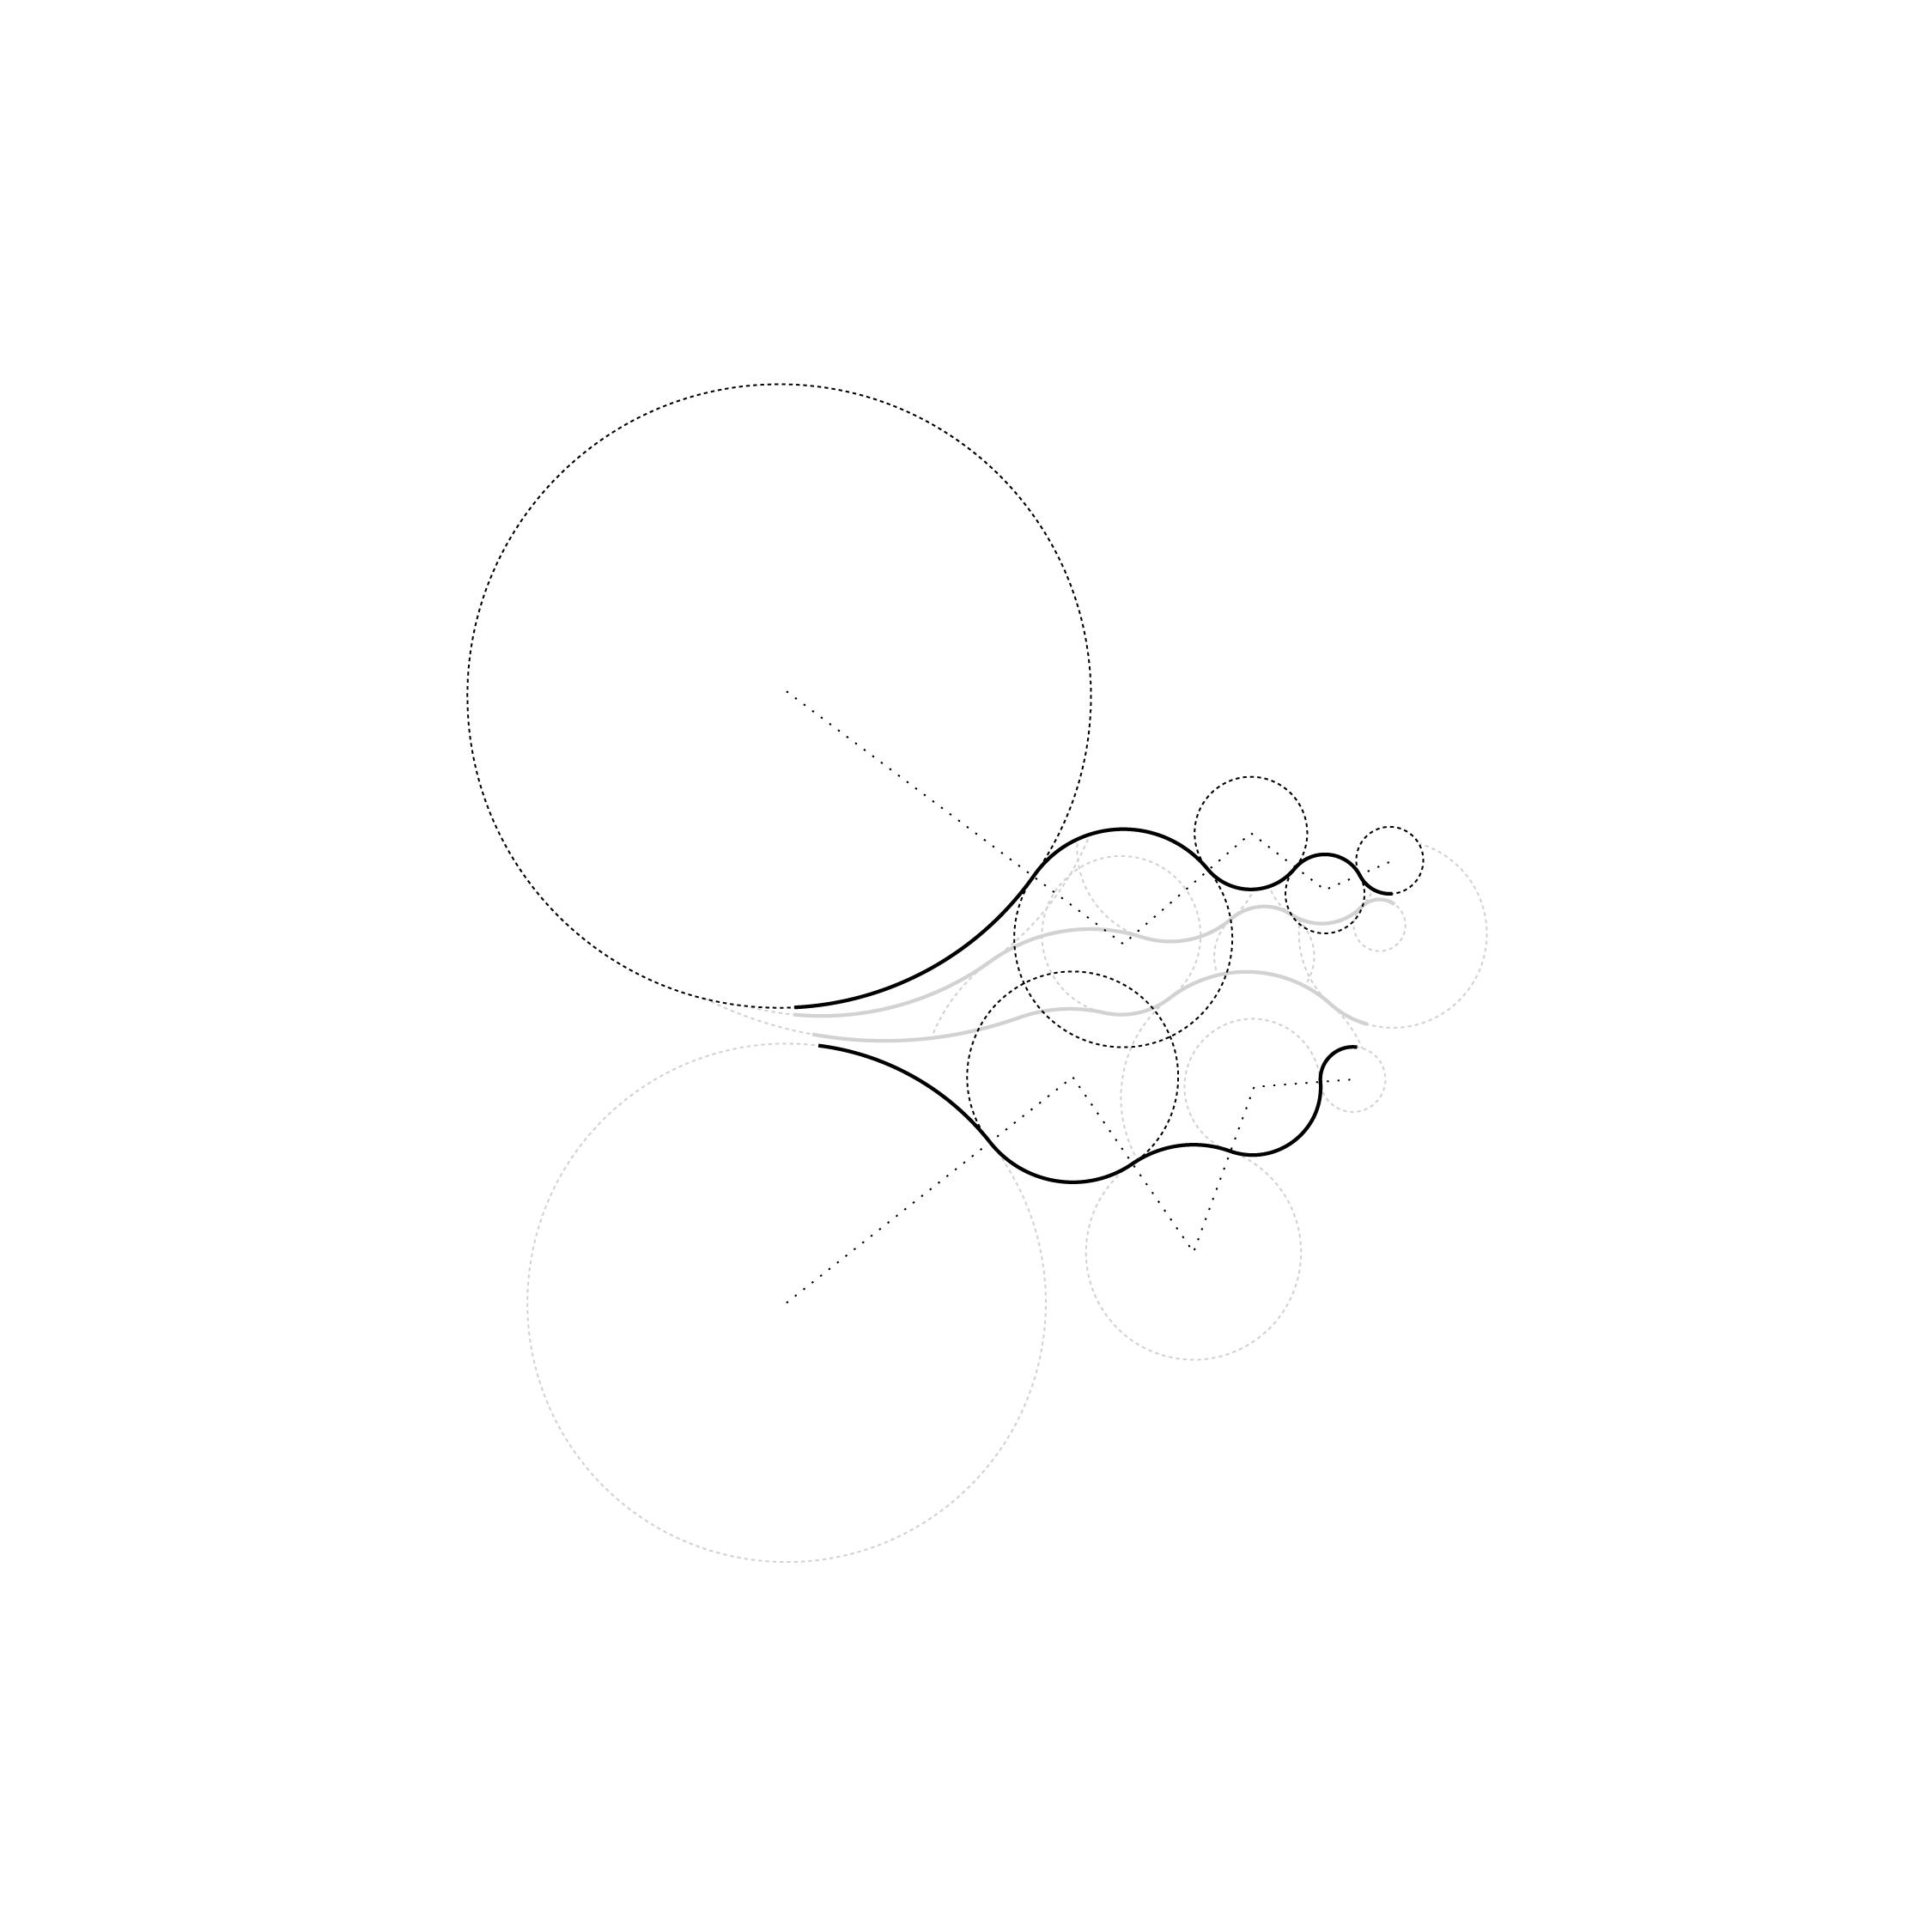 140913 eye-lips circle anayisys-02.jpg